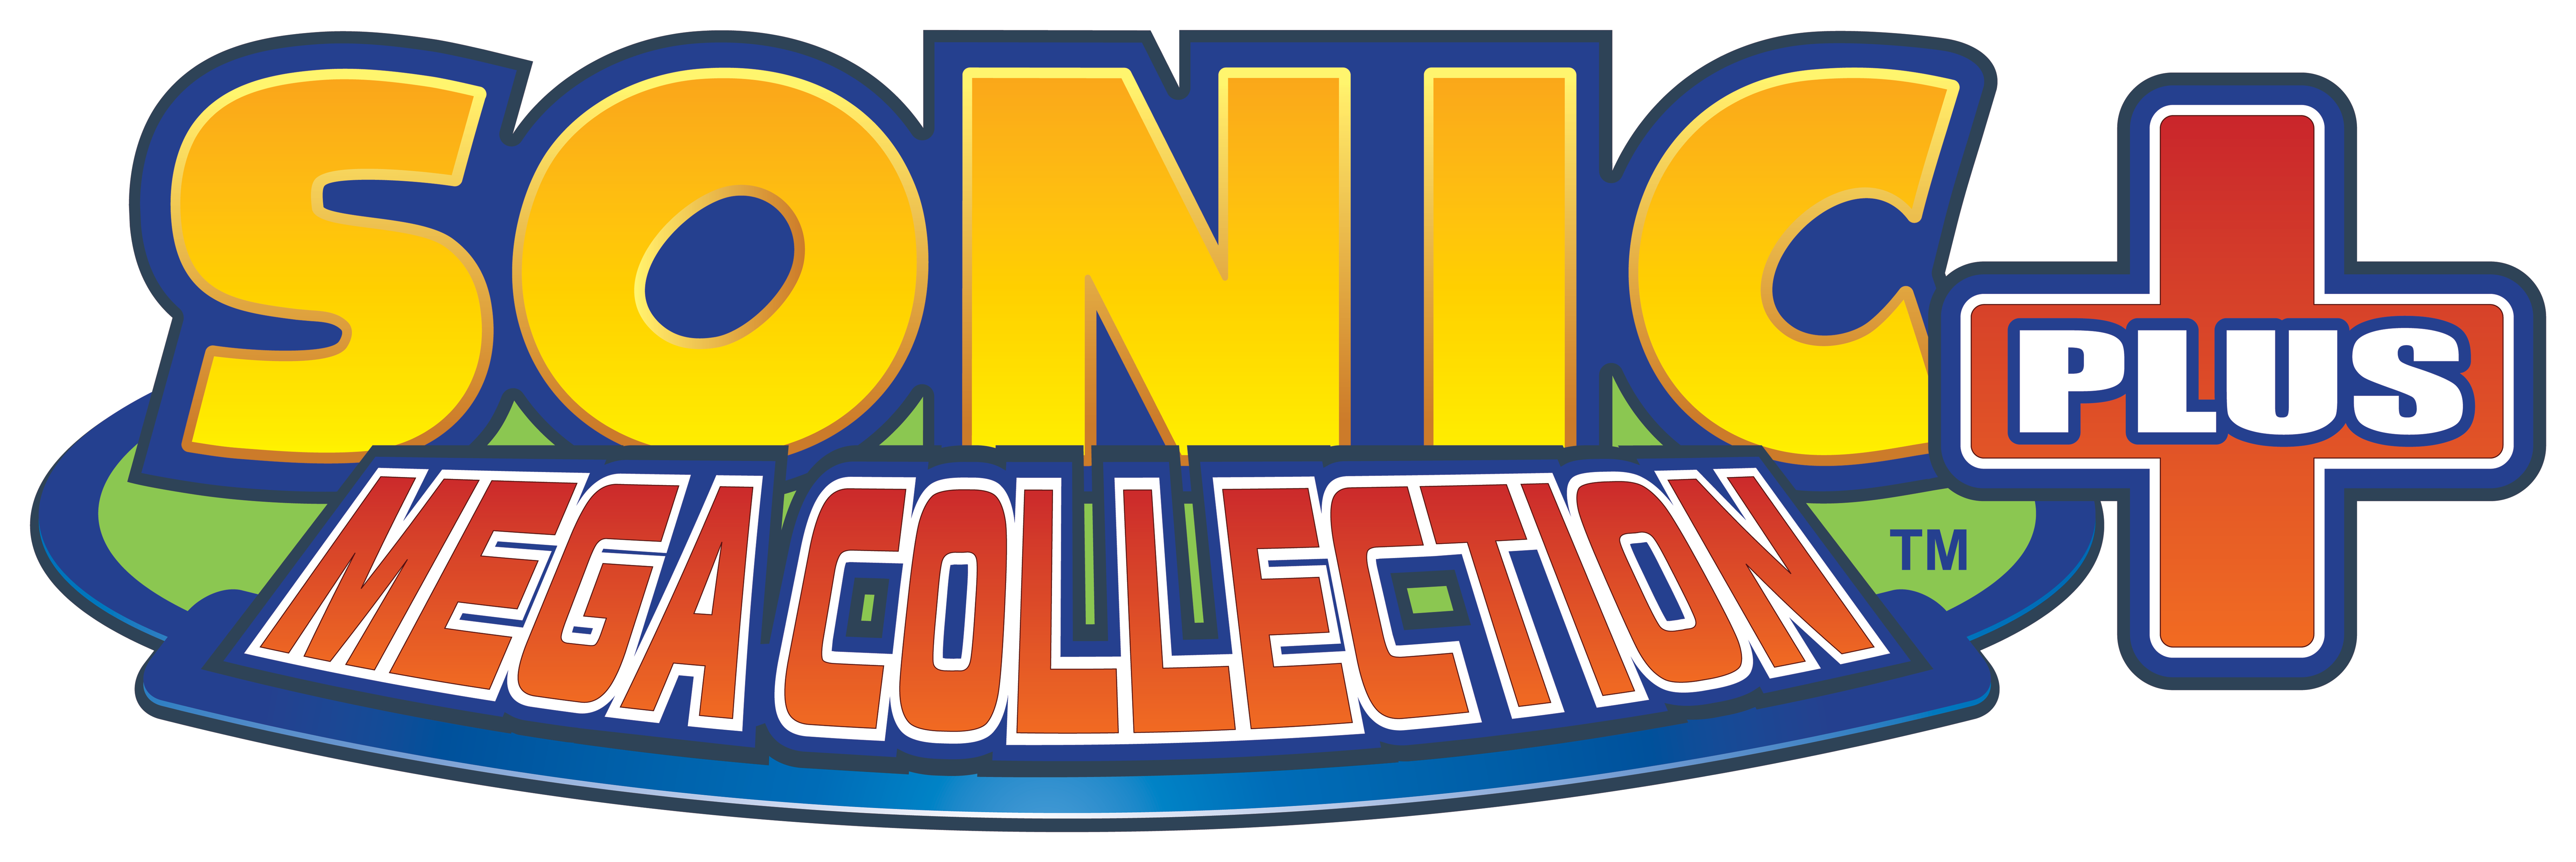 Sonic Mega Collection Logo photo - 1